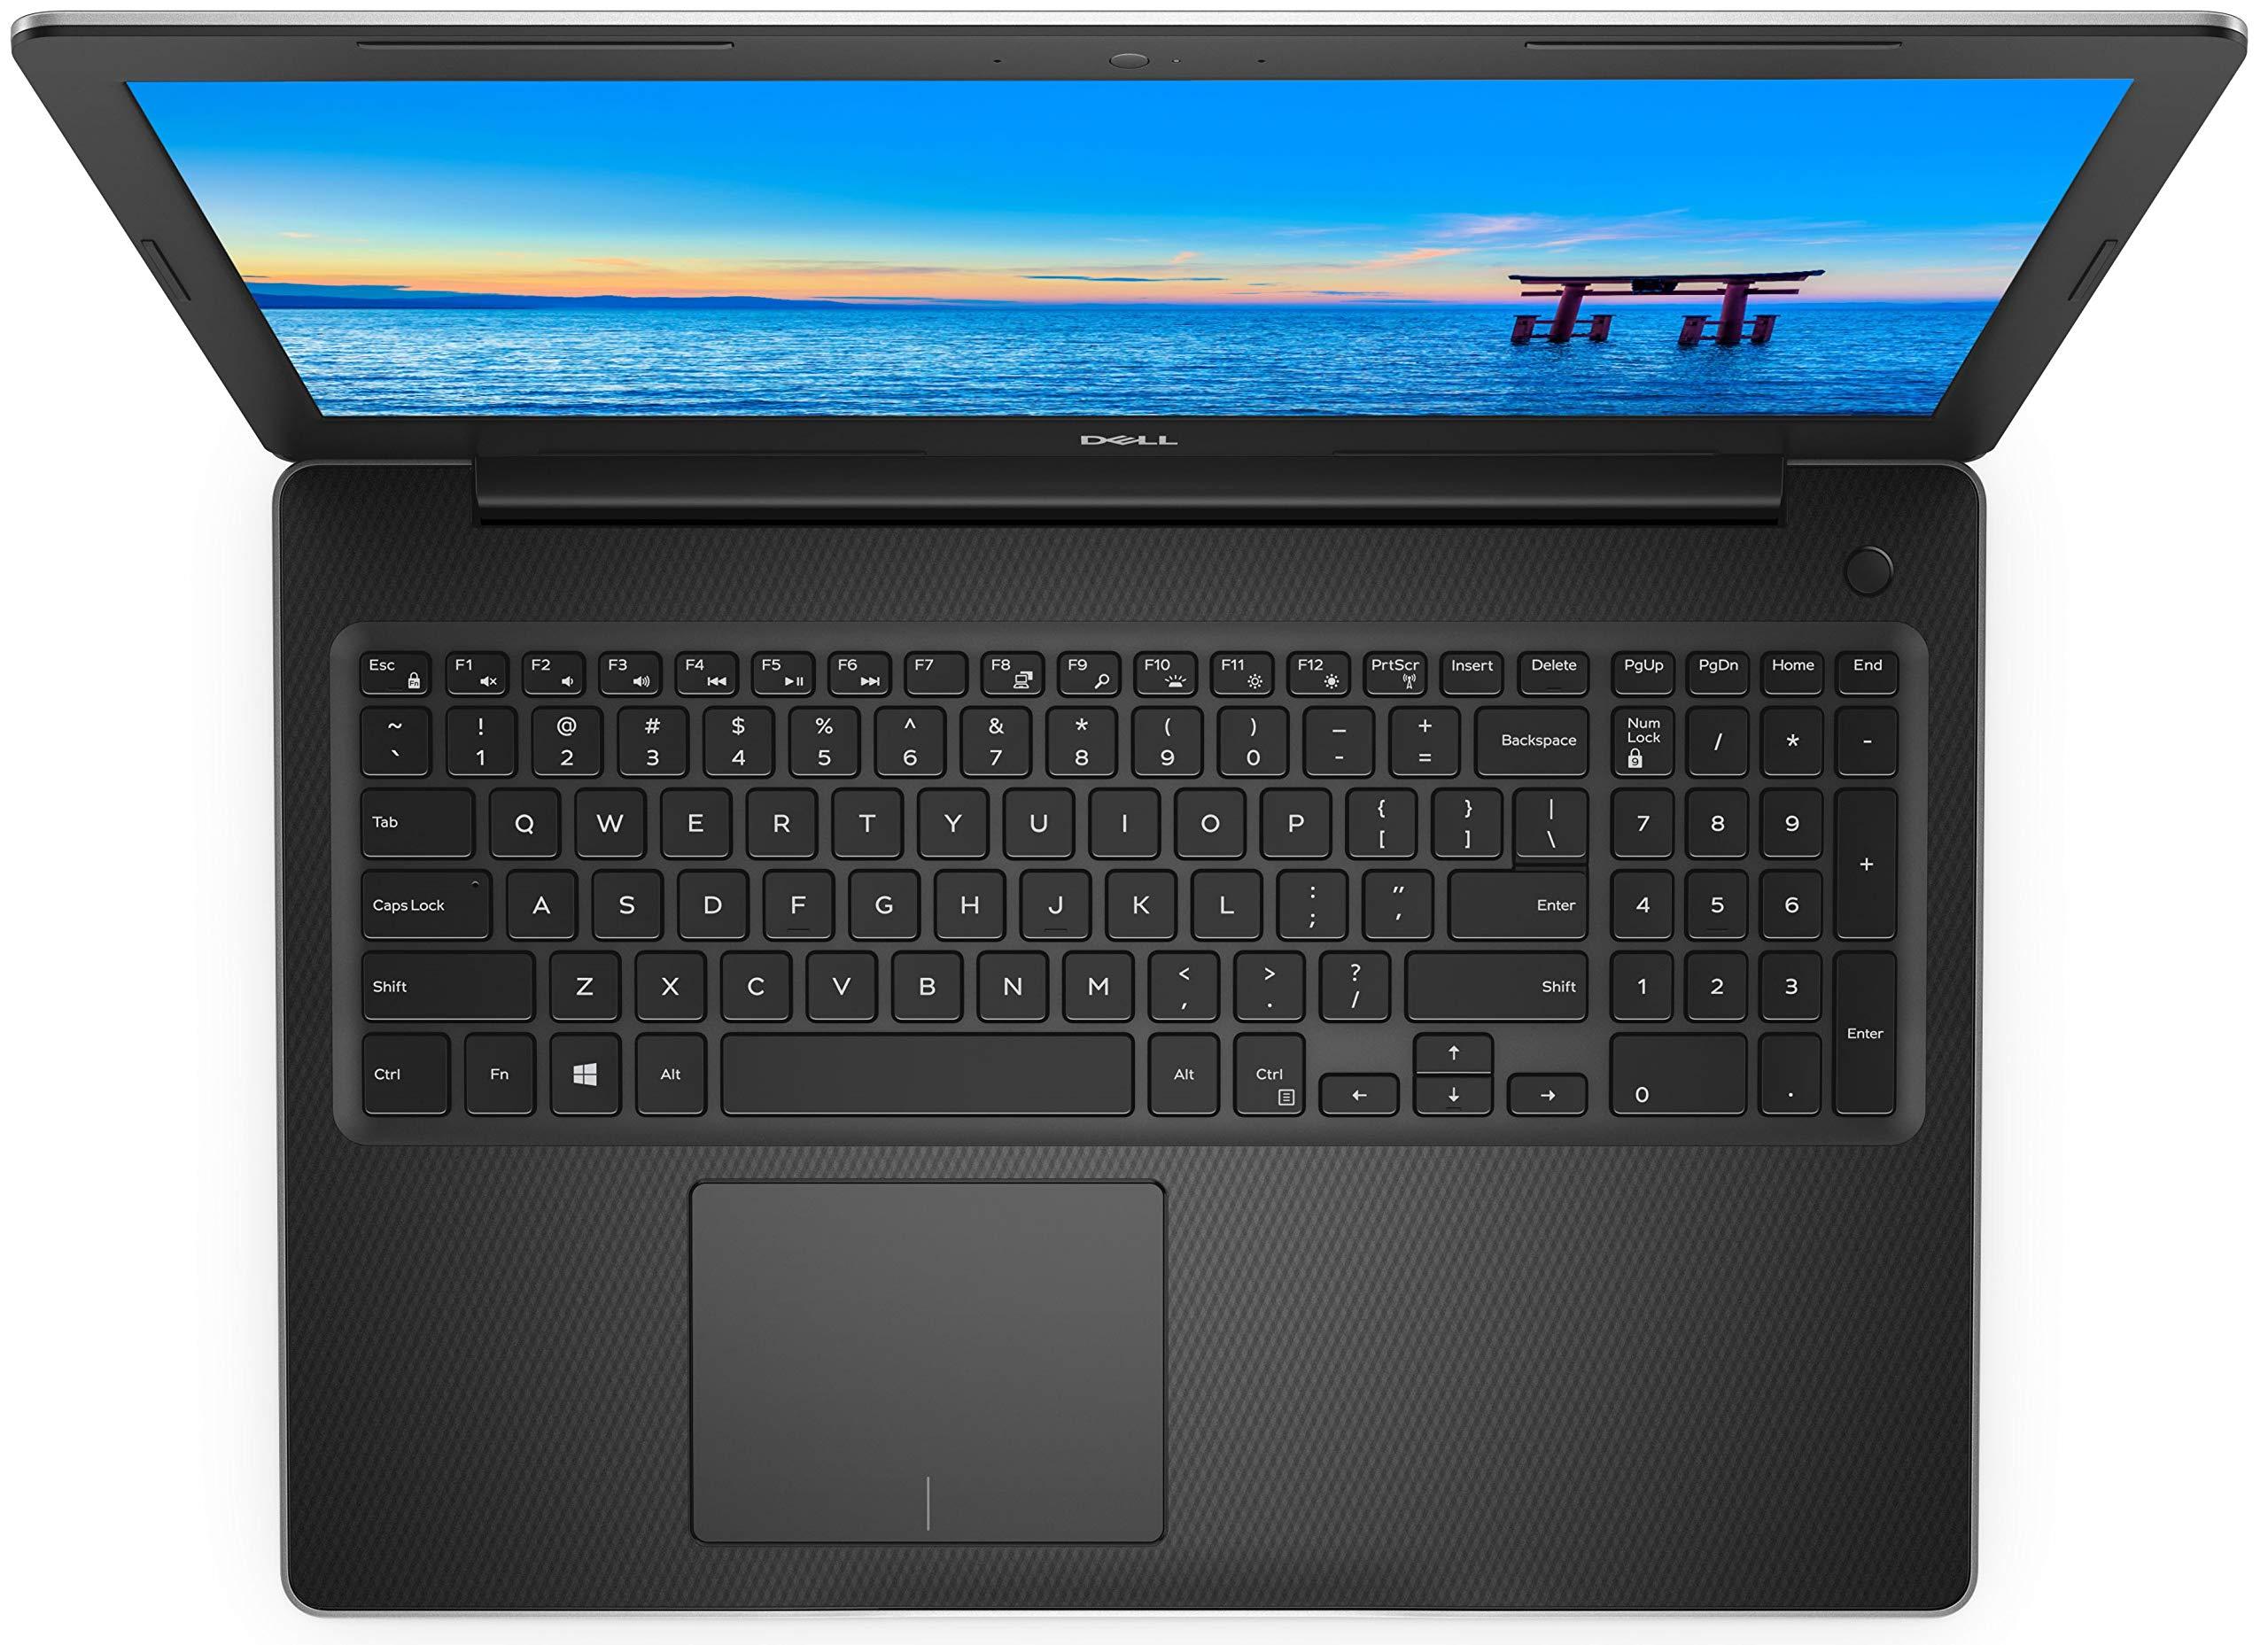 Dell-Inspiron-15-Anti-Glare-LED-backlit-2019-Laptop